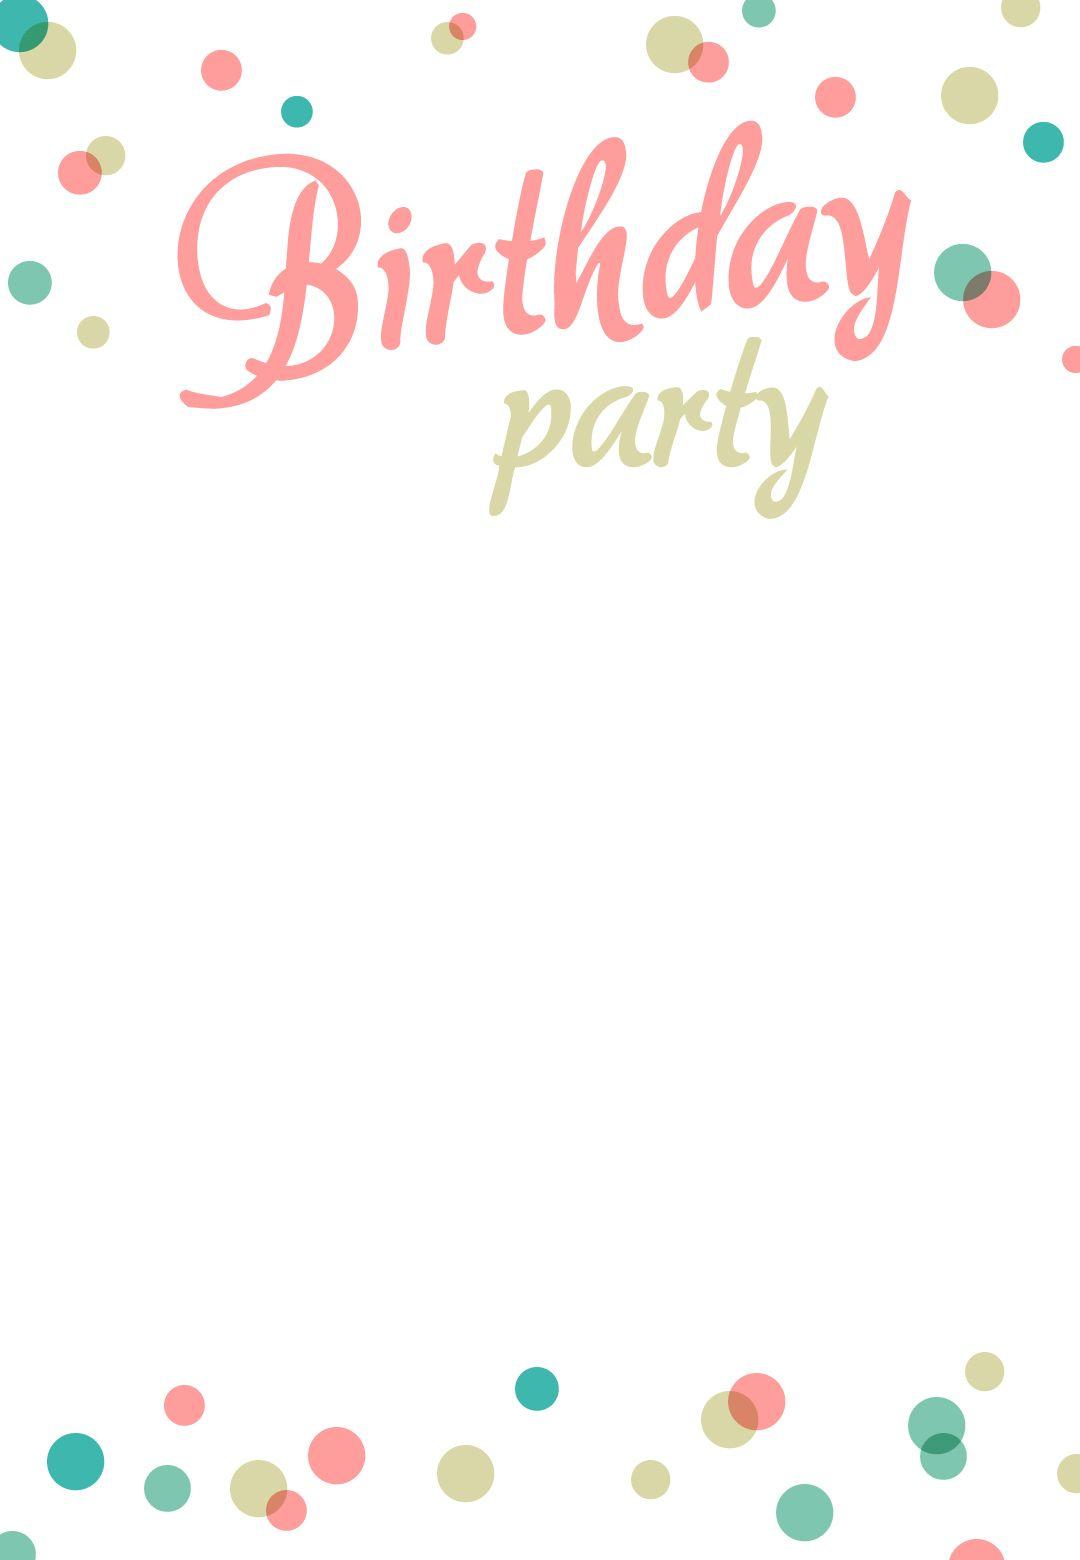 Birthday Party #invitation Free Printable | Addison's 1St Birthday - Free Printable Birthday Invitation Templates